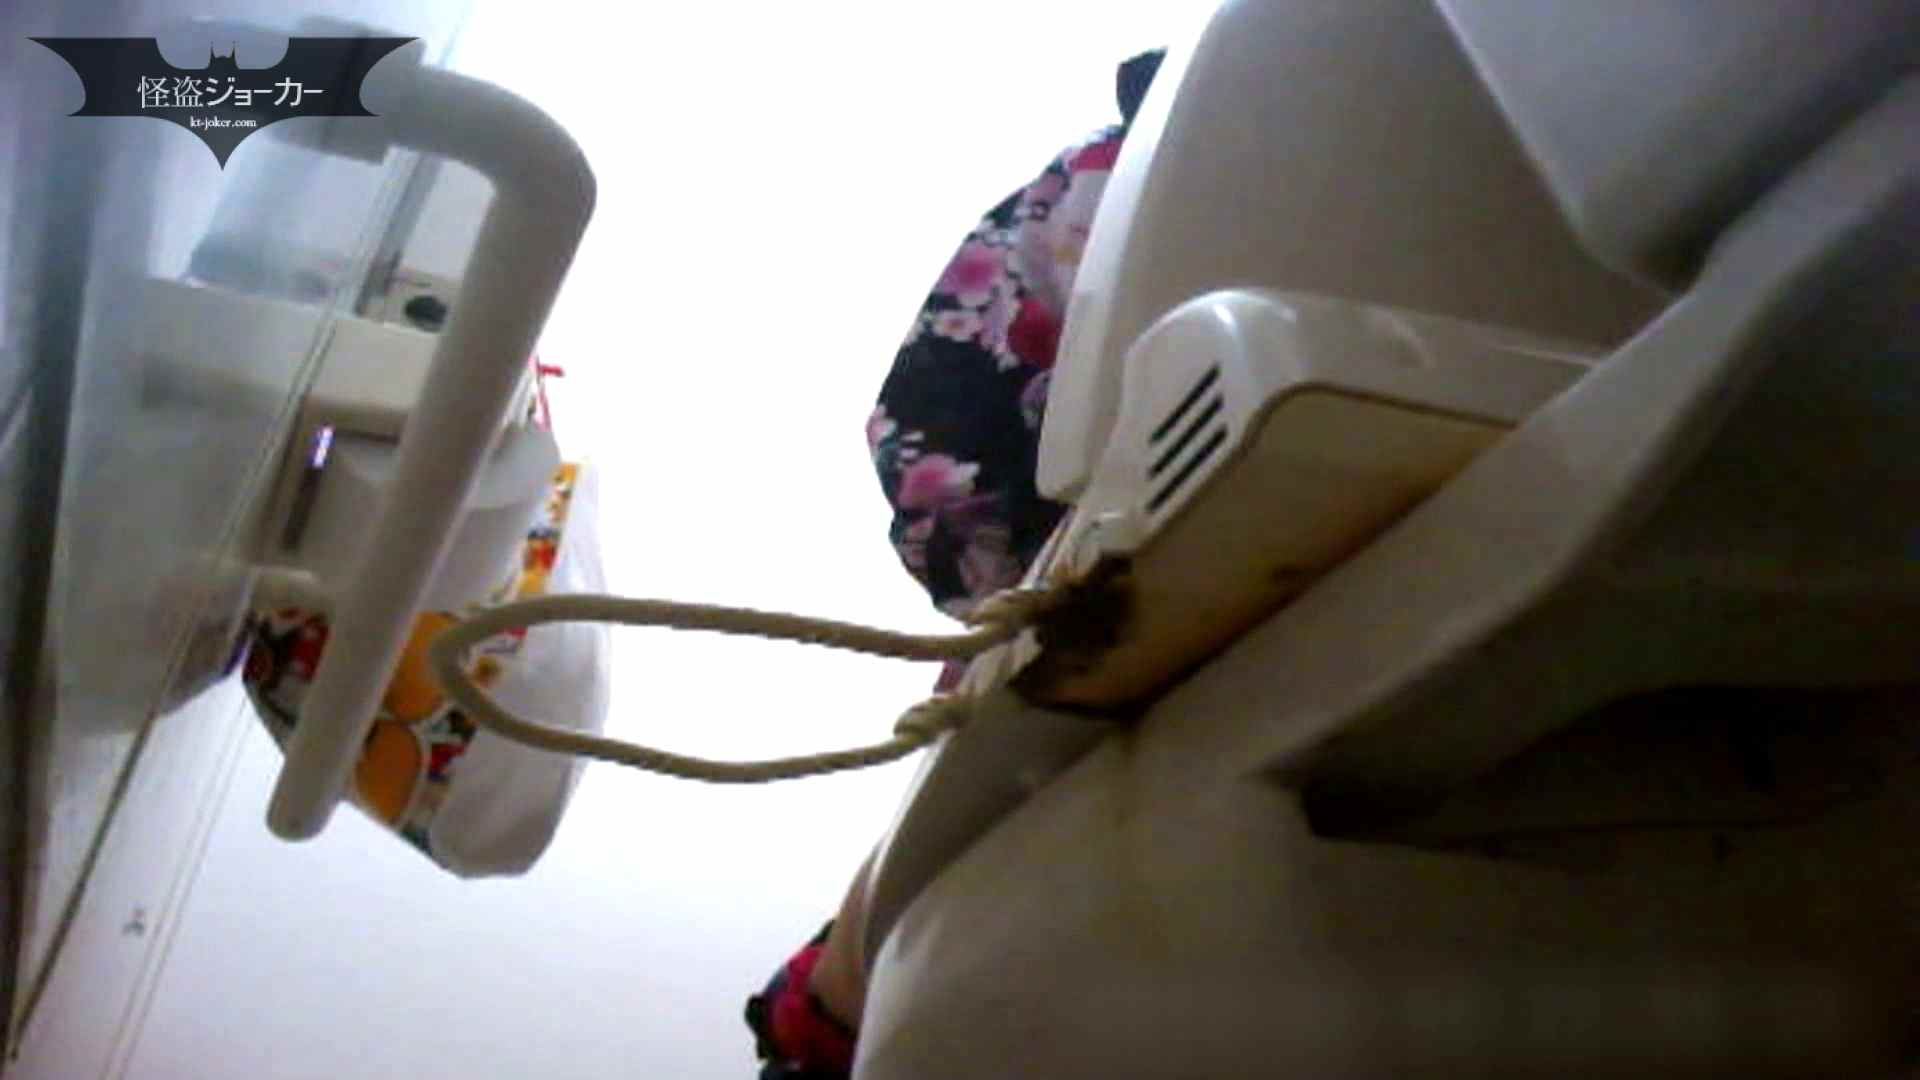 店長代理の盗撮録 Vol.05 潜入 ワレメ無修正動画無料 55画像 8